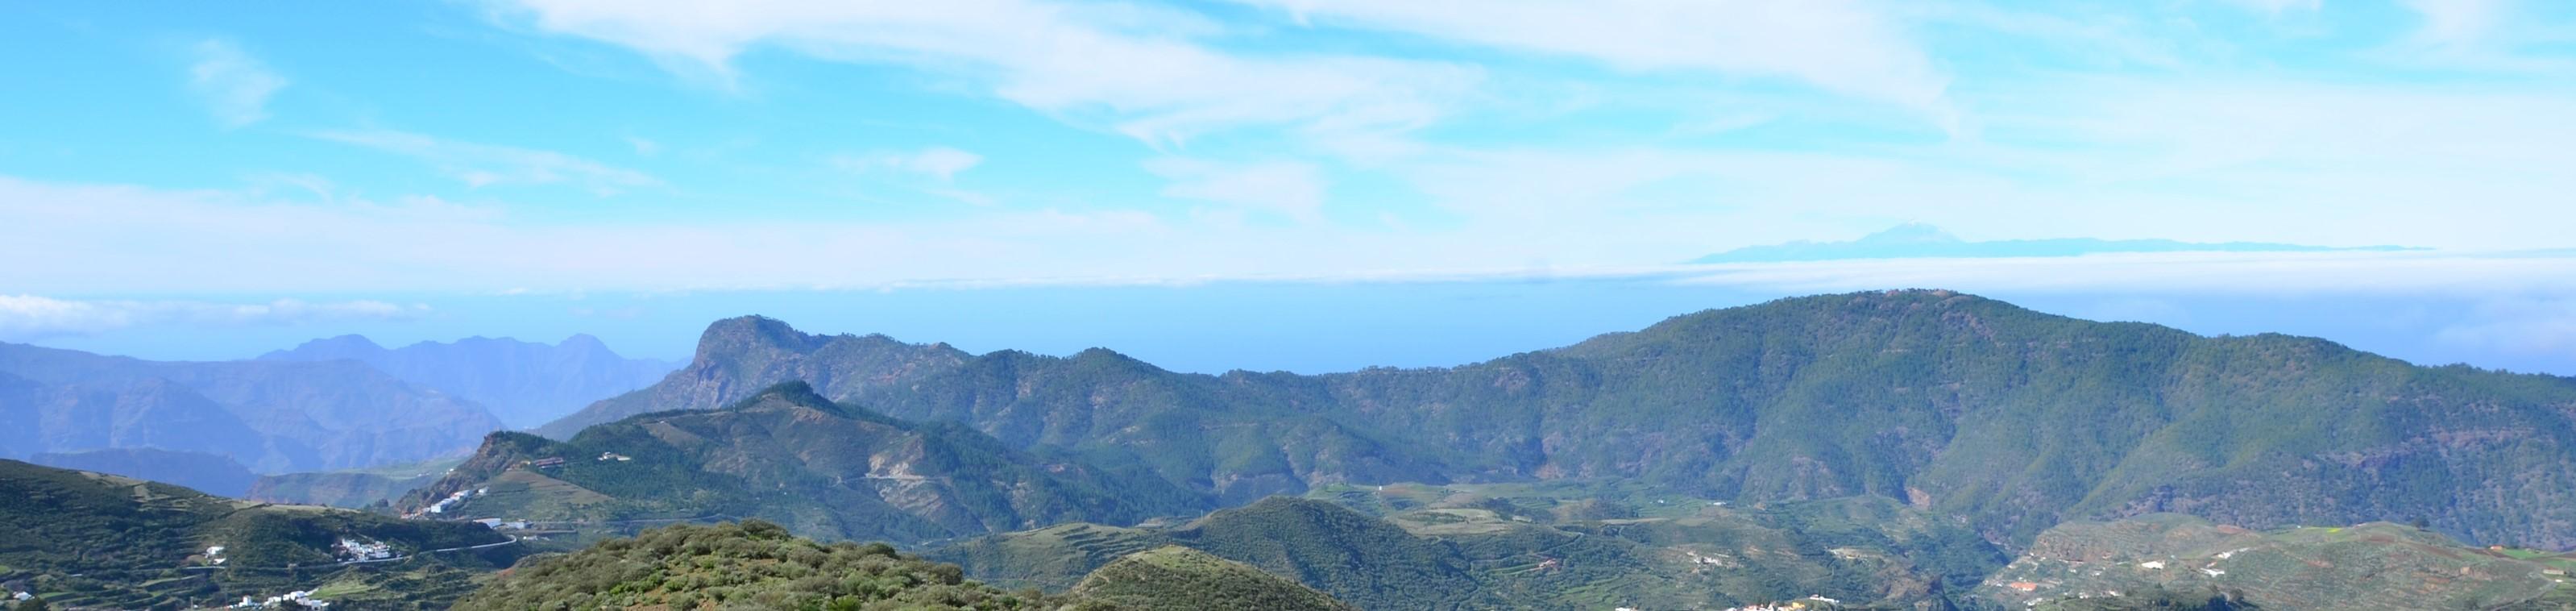 Pittoresk vakantiehuis op Gran Canaria